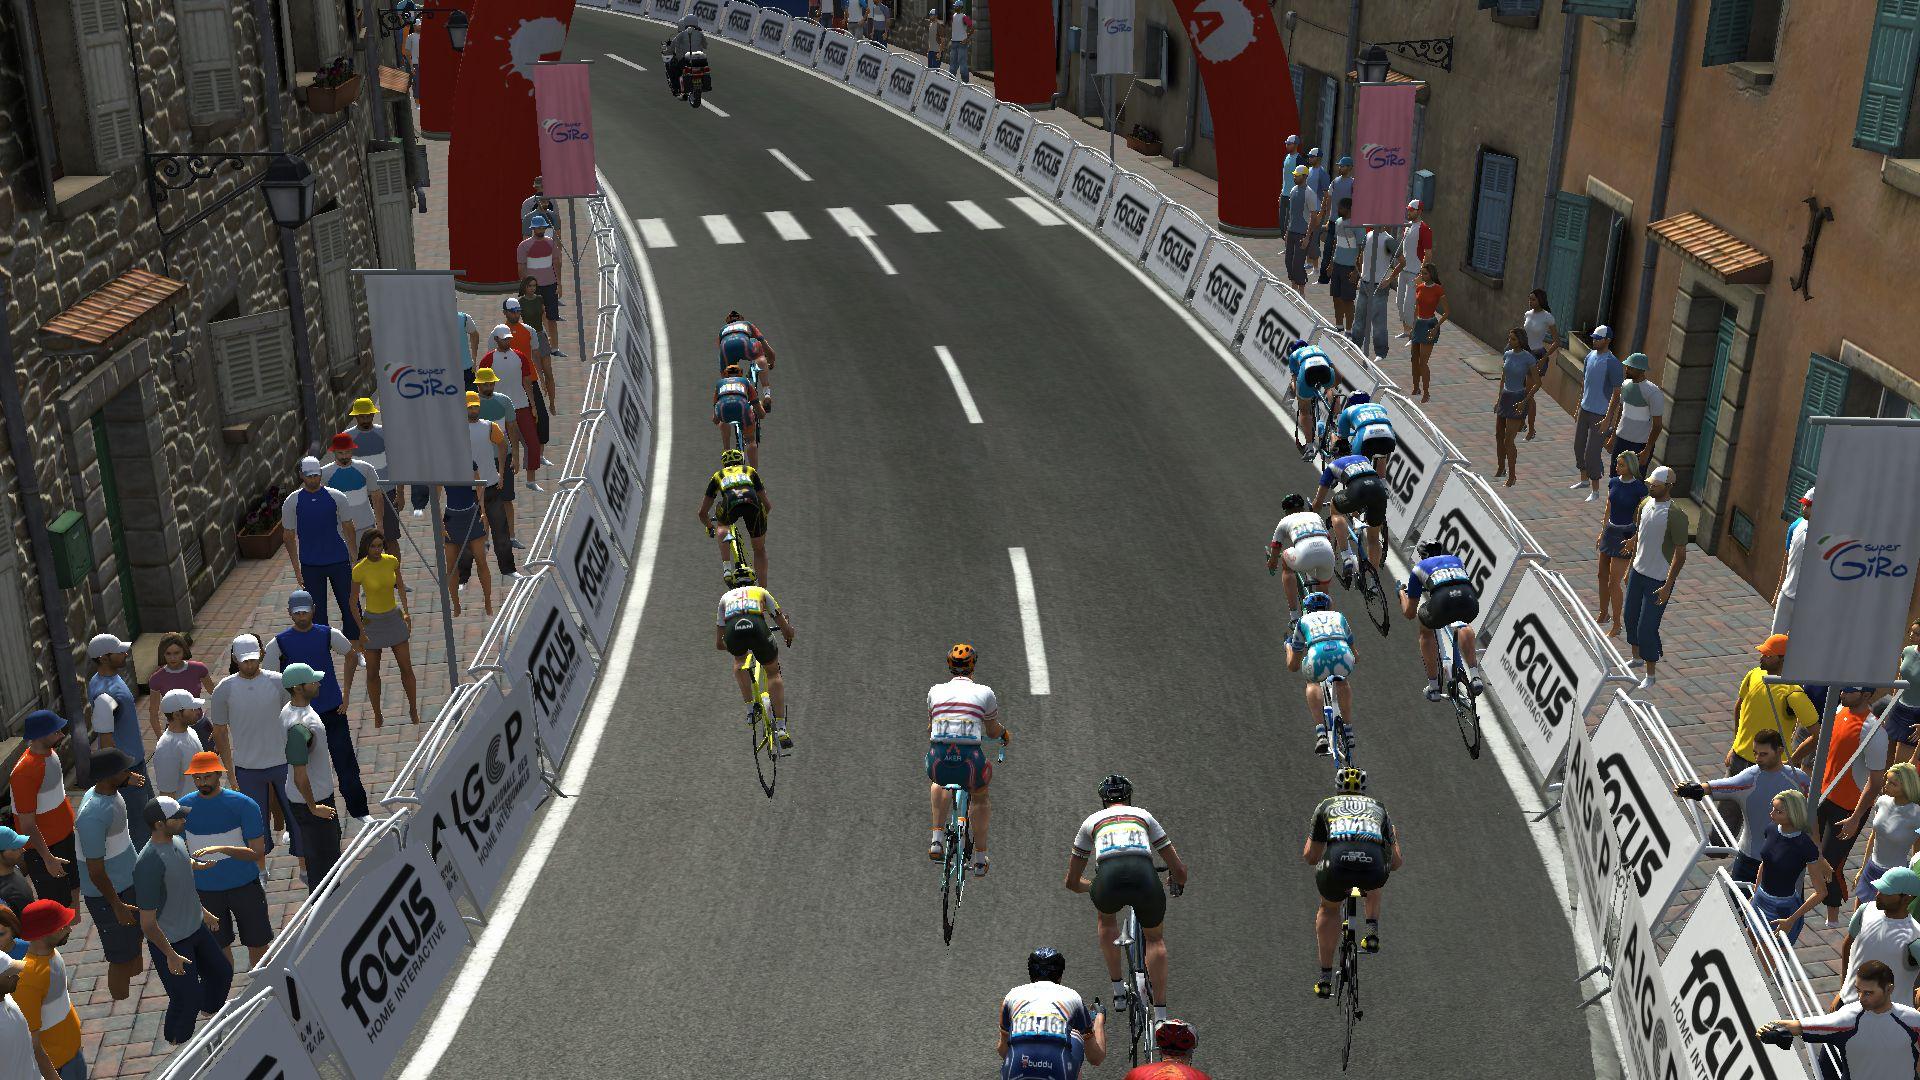 pcmdaily.com/images/mg/2019/Races/GTM/Giro/mg19_giro_10_PCM0132.jpg